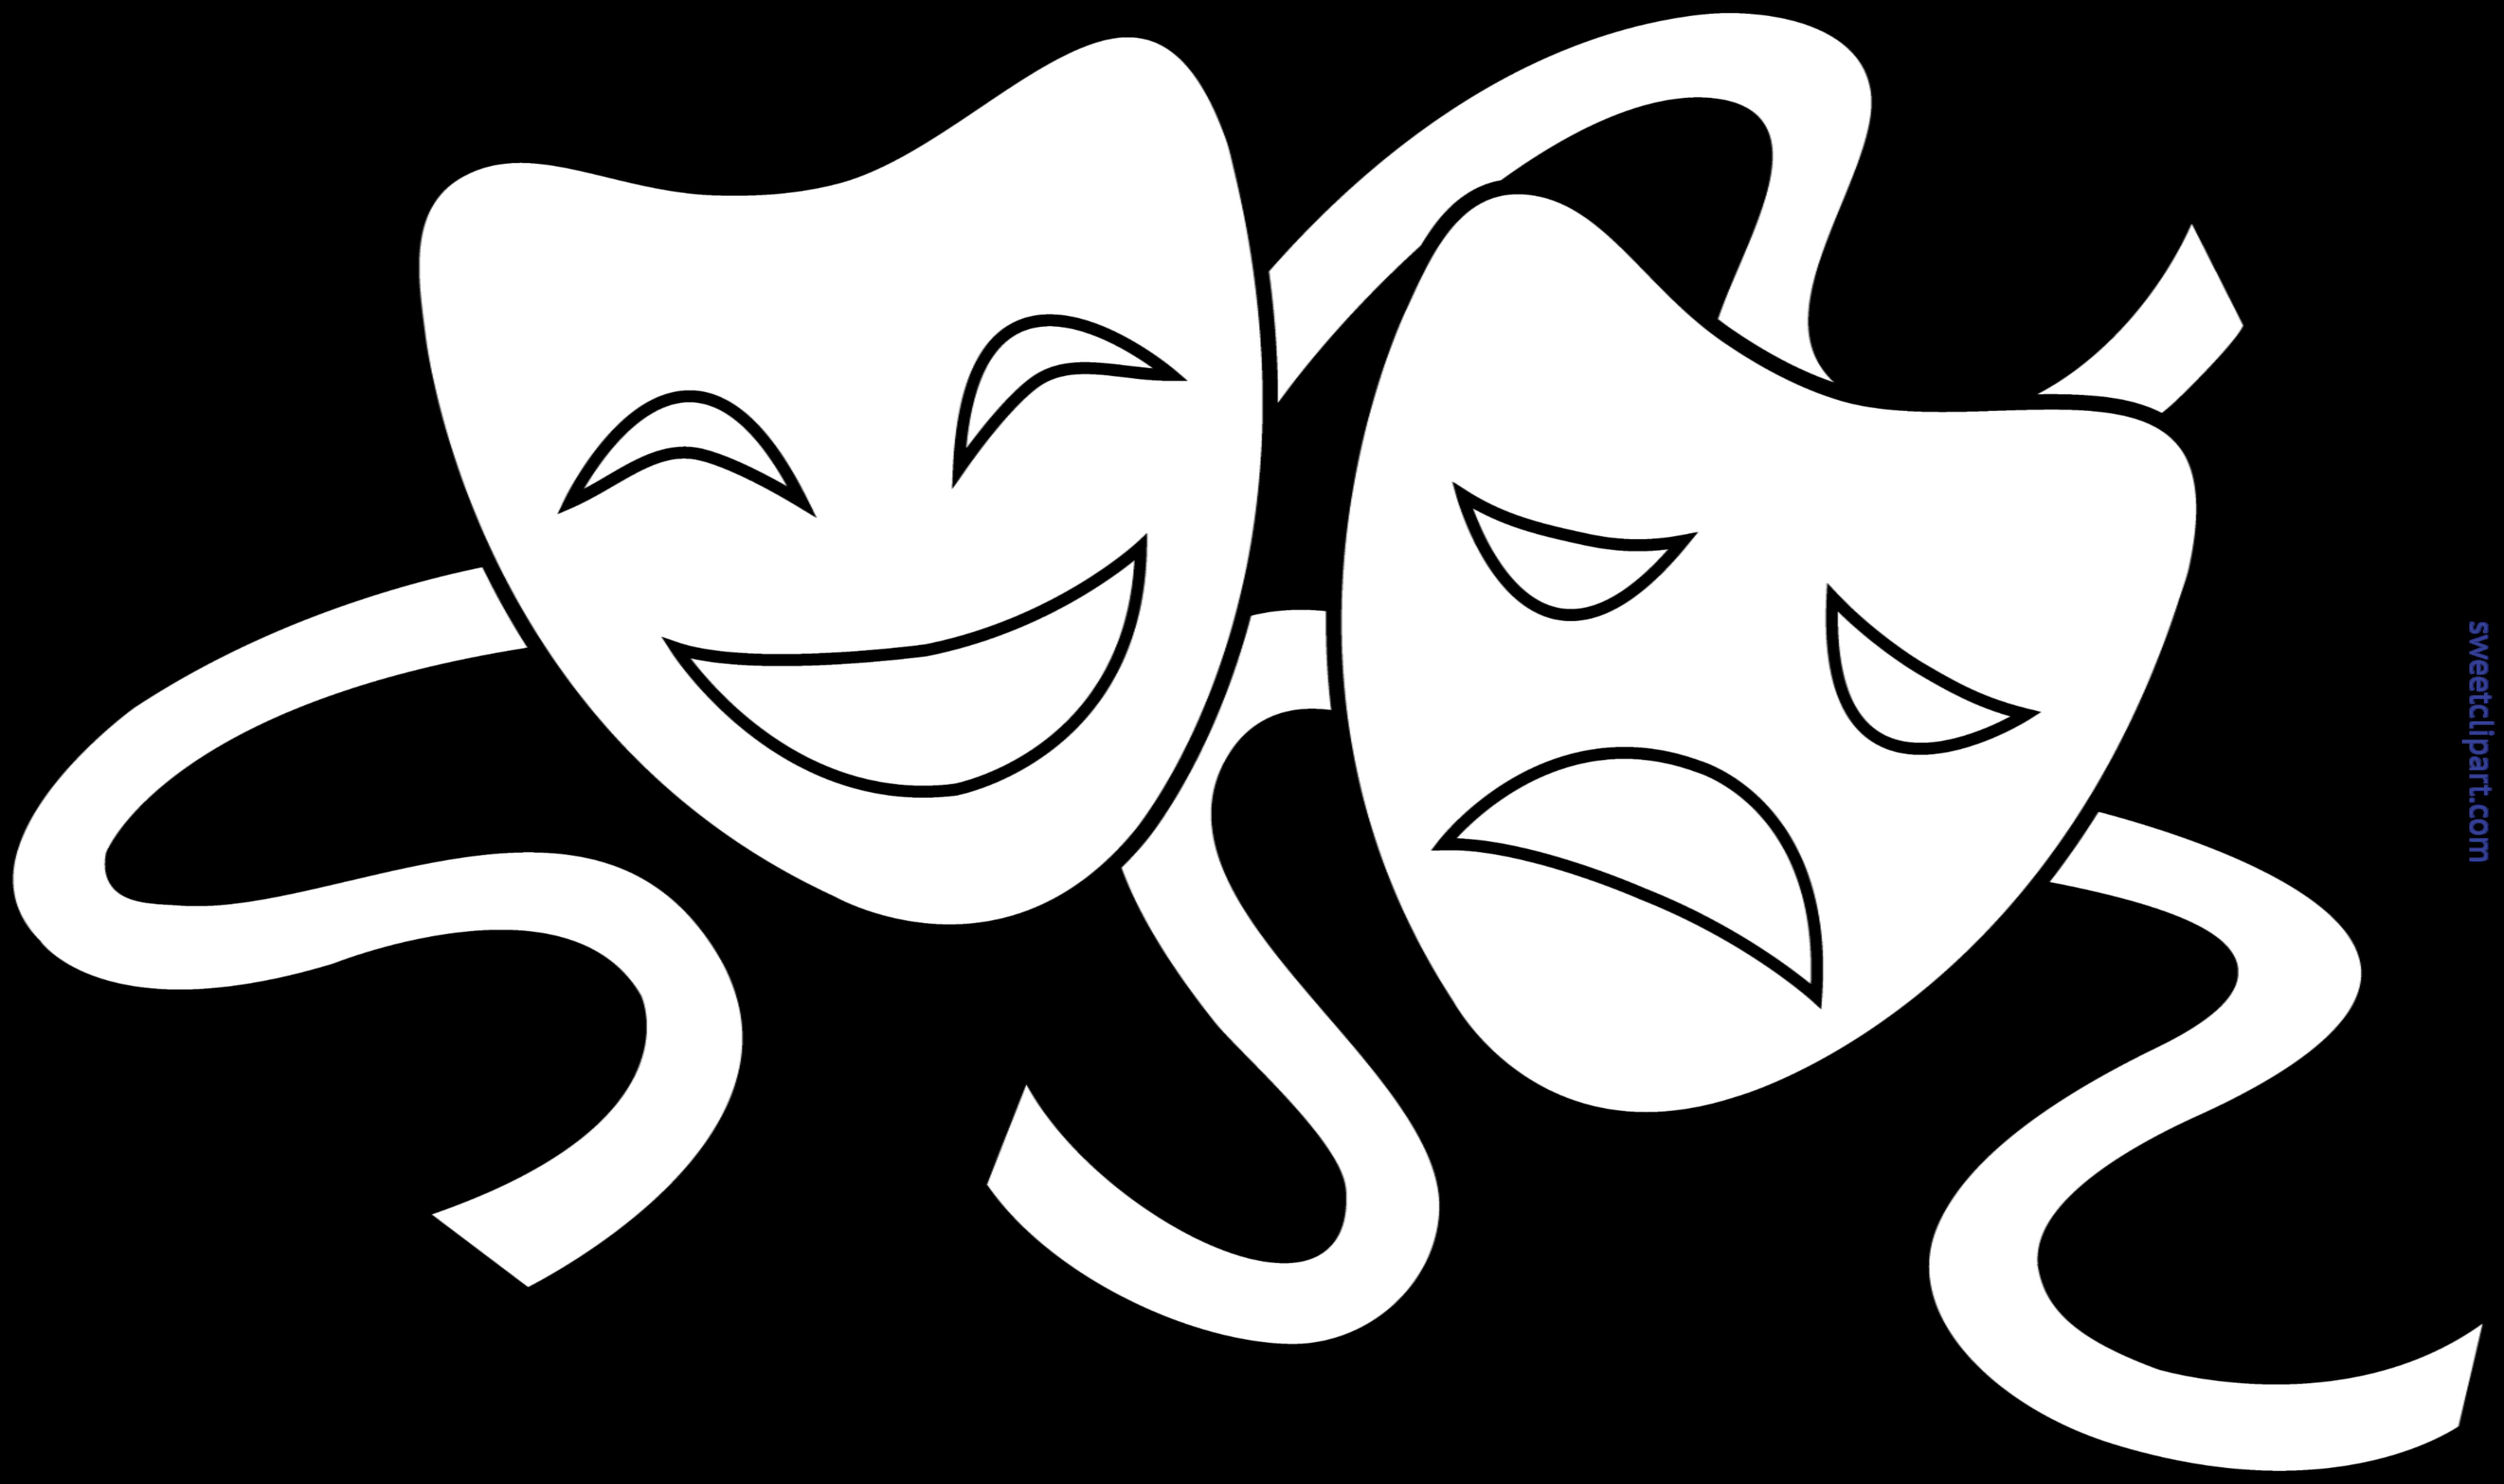 Mask clipart line art. Theater masks lineart clip